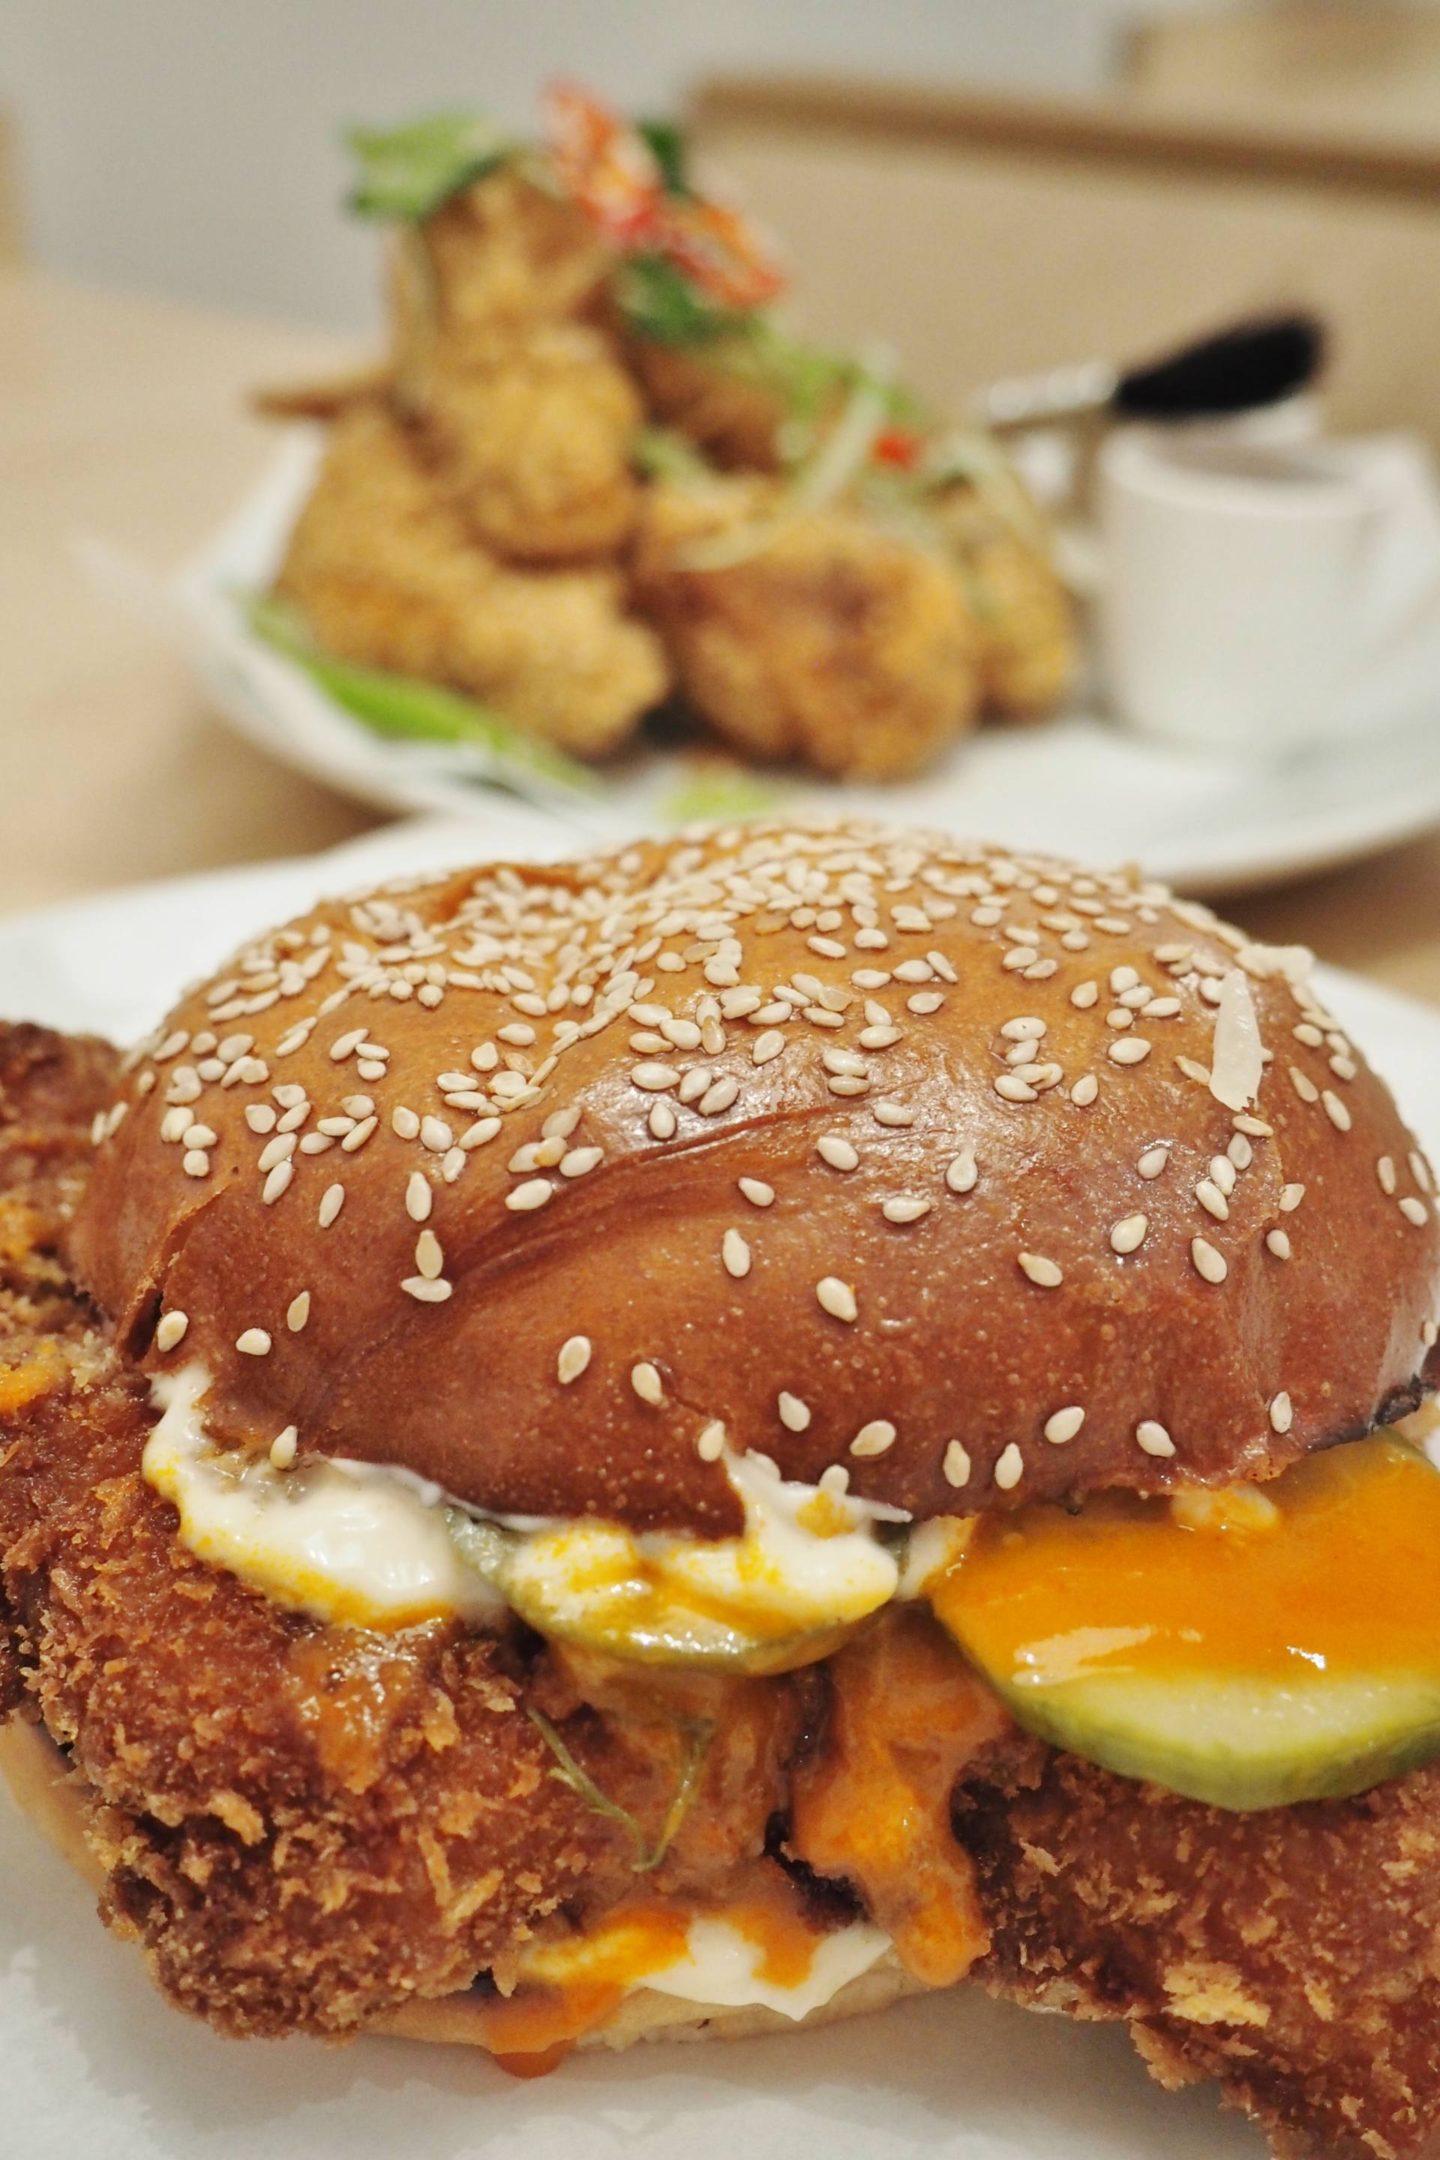 Coqfighter BoxPark Shoreditch Buffalo Burger